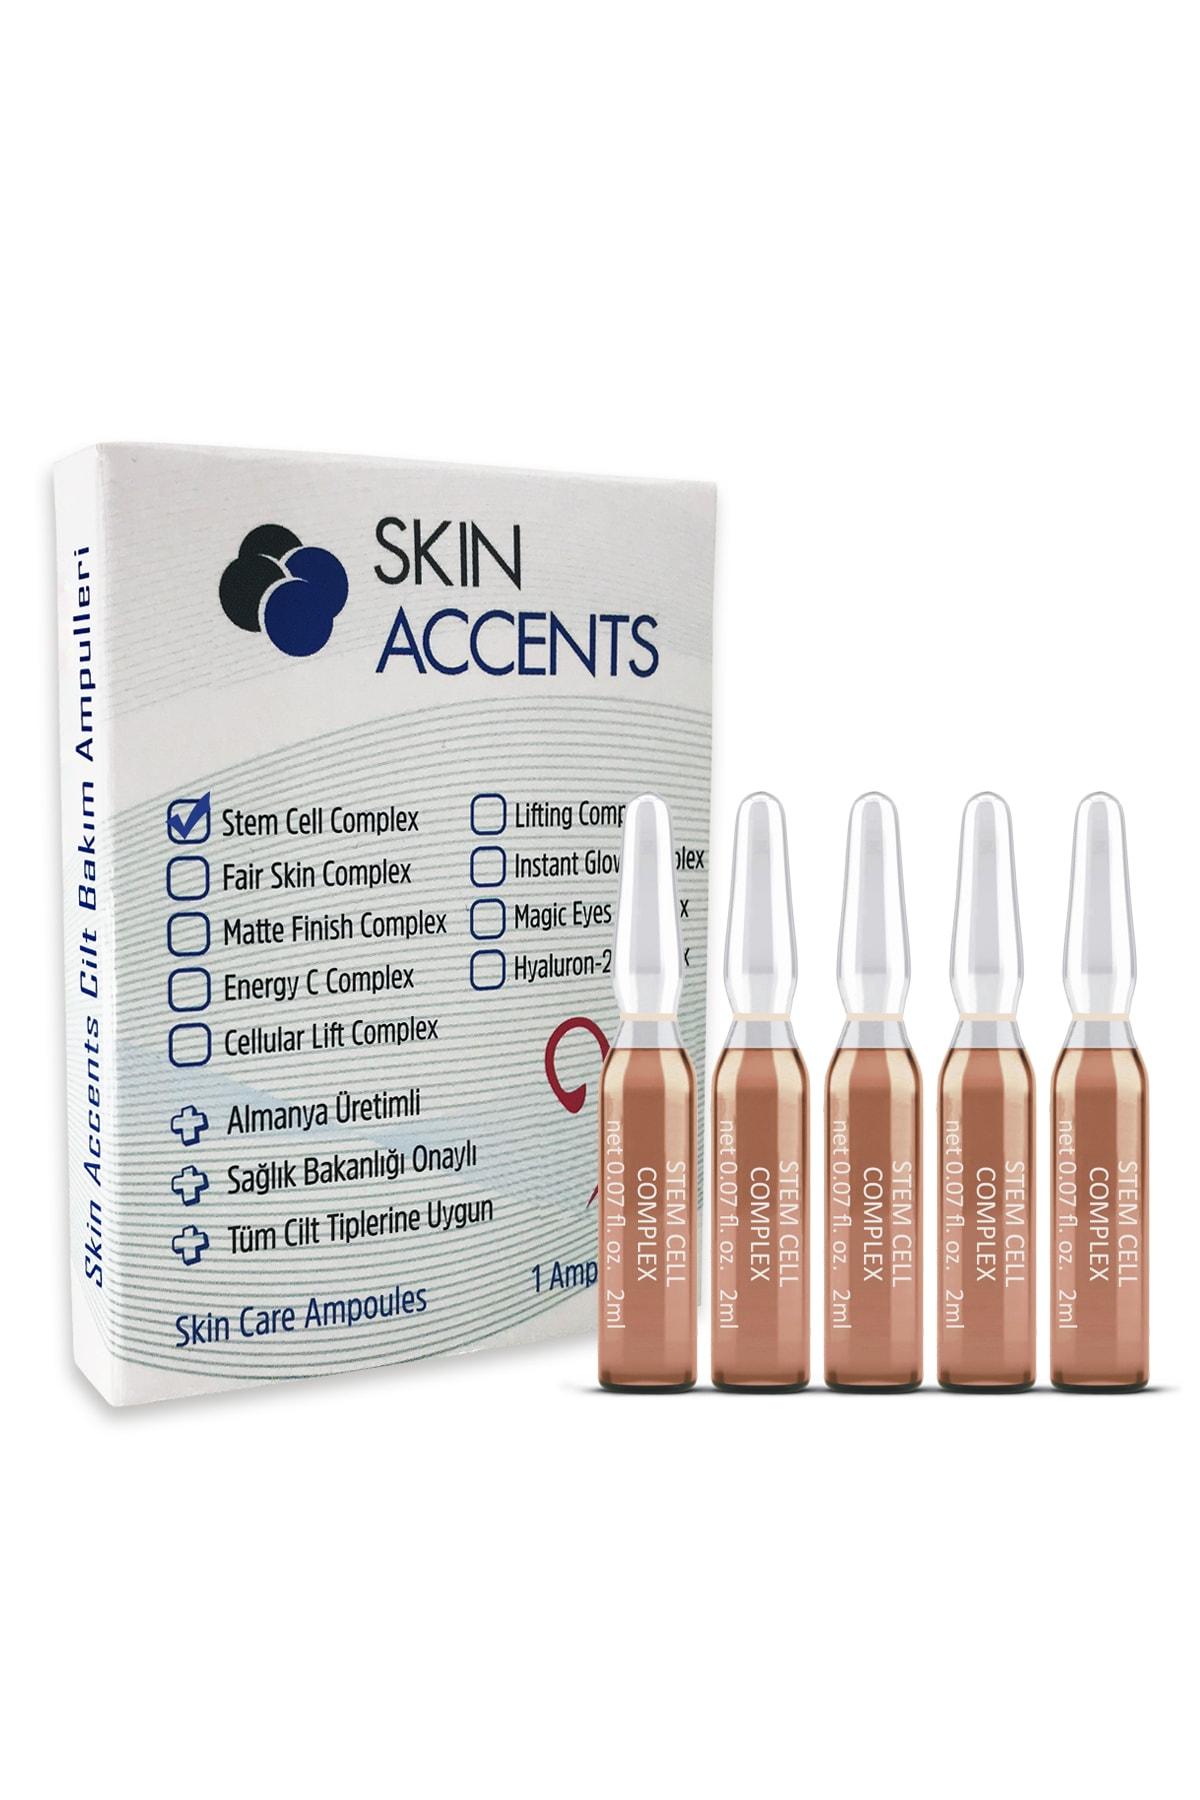 Skin Accents 5 Adet Kök Hücre Ampul Alman Serum Dermaroller Dermapen Cilt Bakım Serumu 1